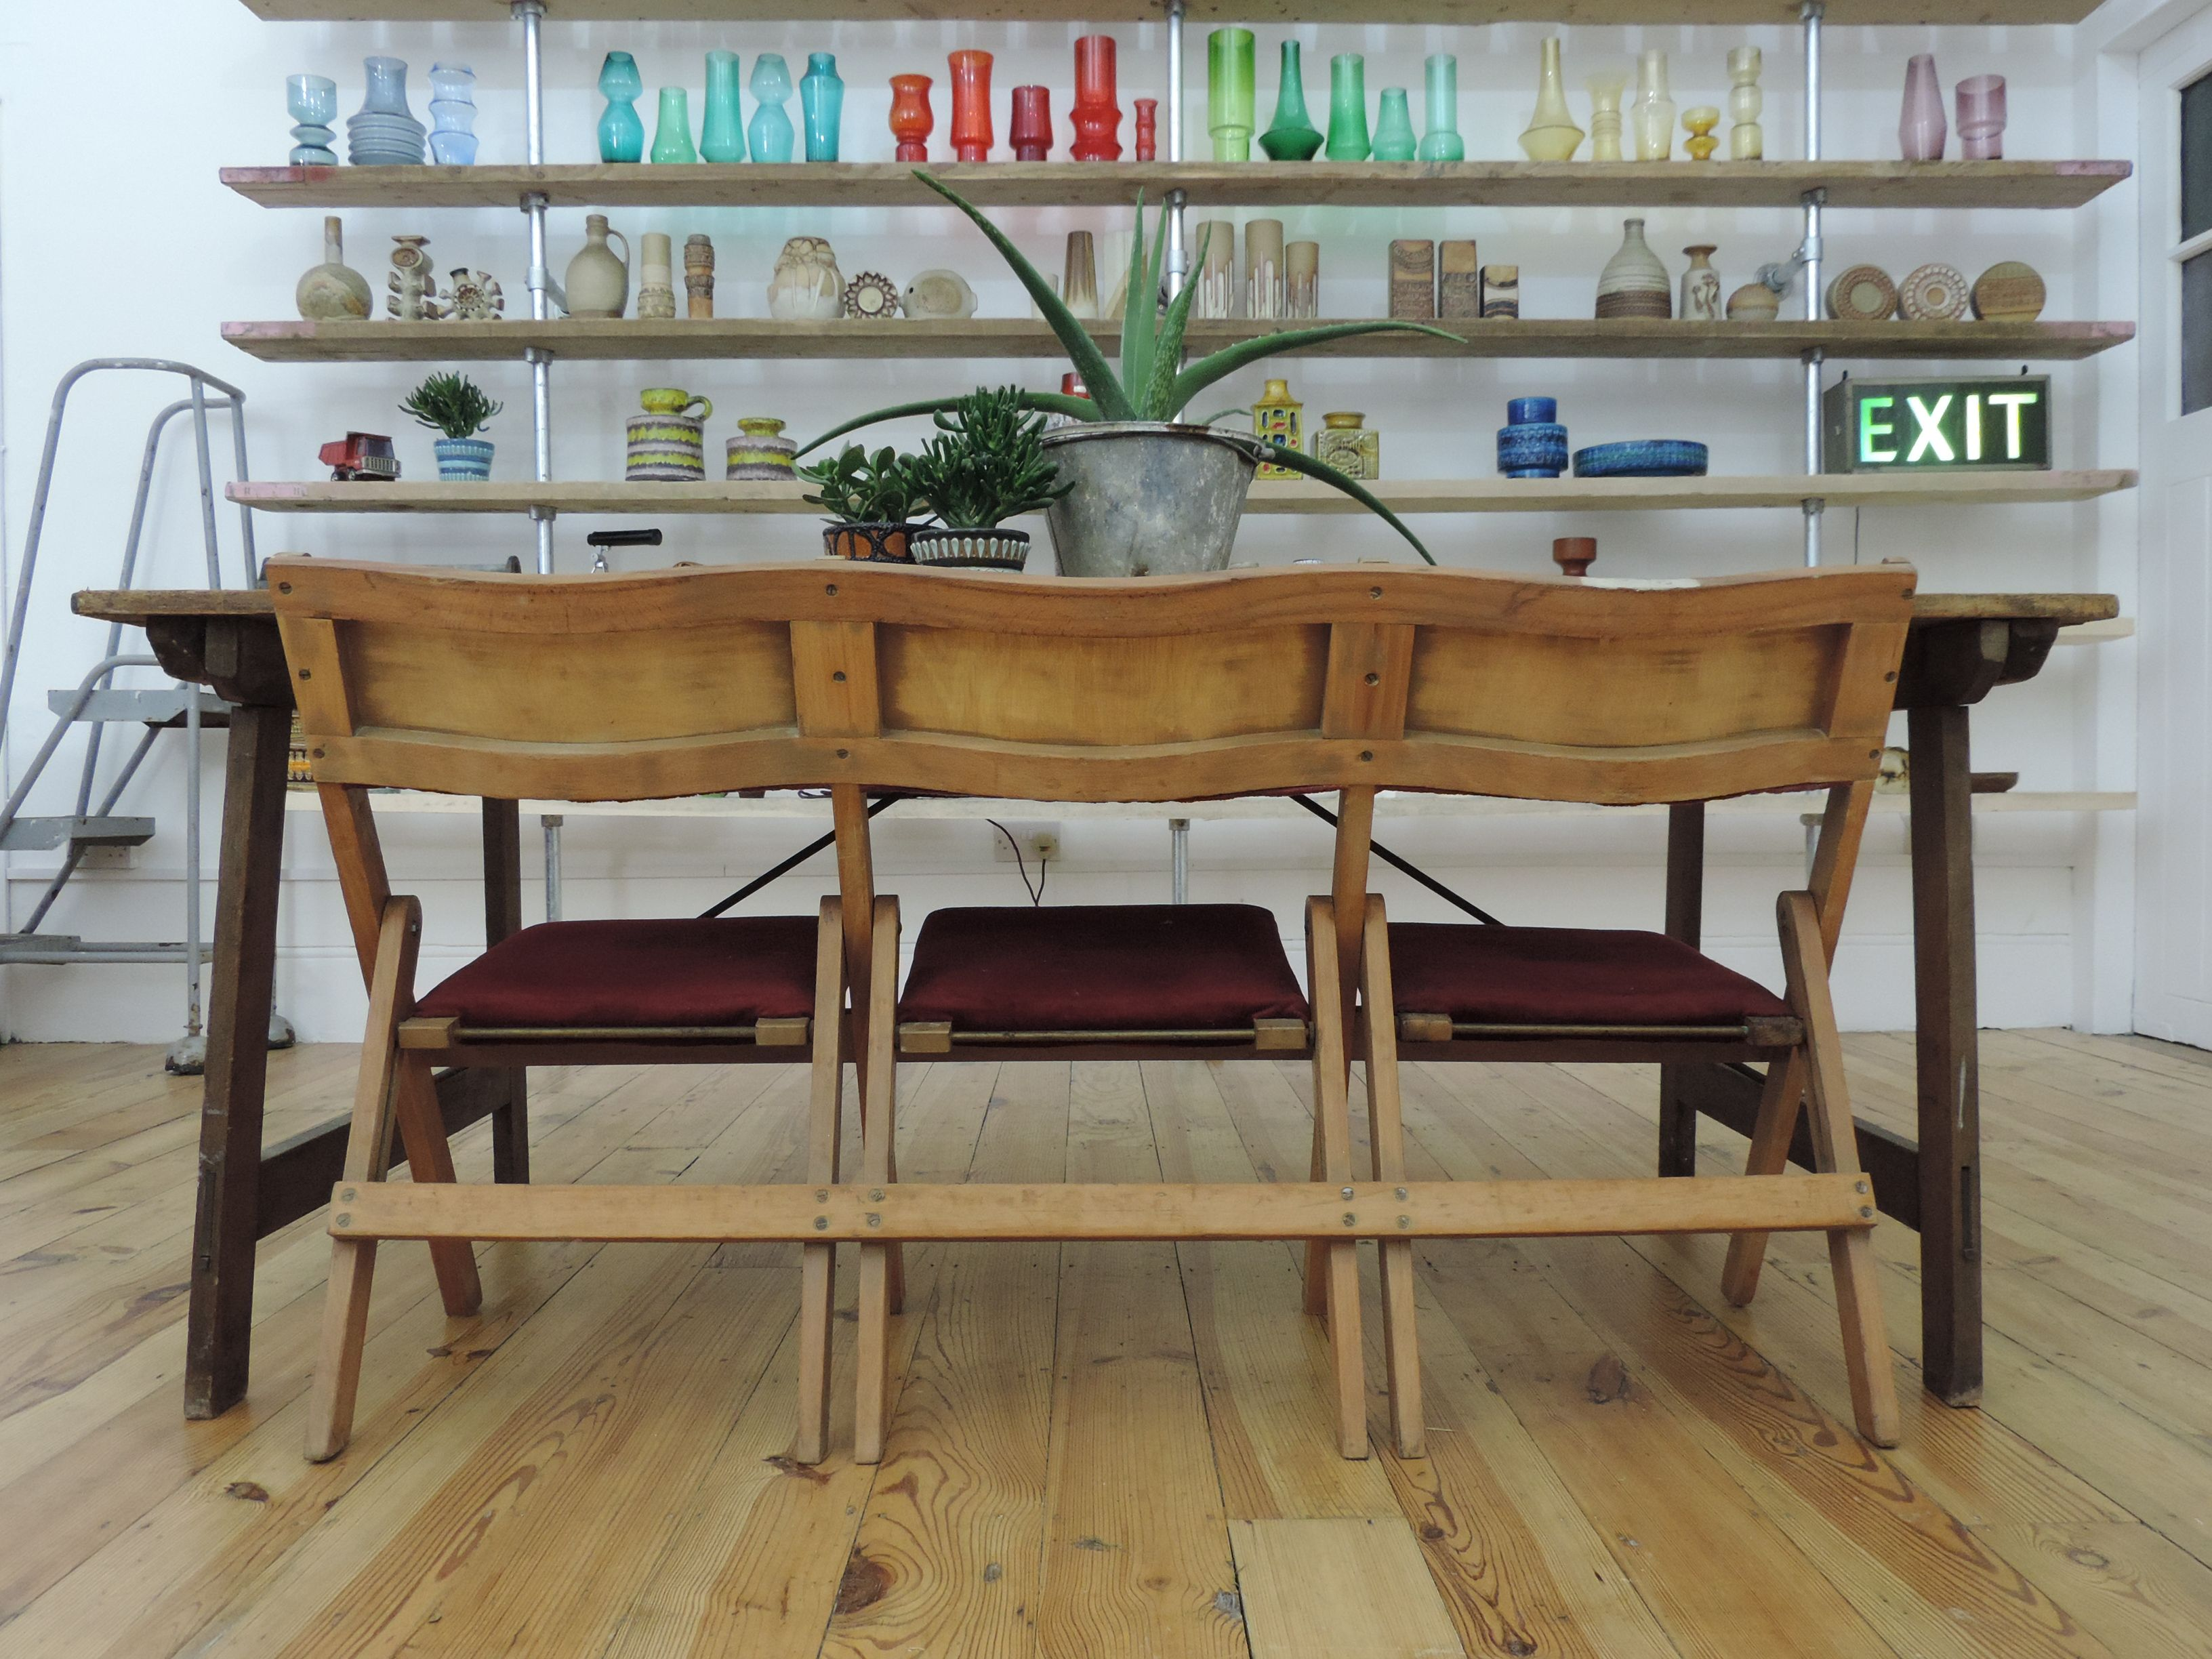 Art deco folding chairs warehouse apartment loft vintage industrial interiors